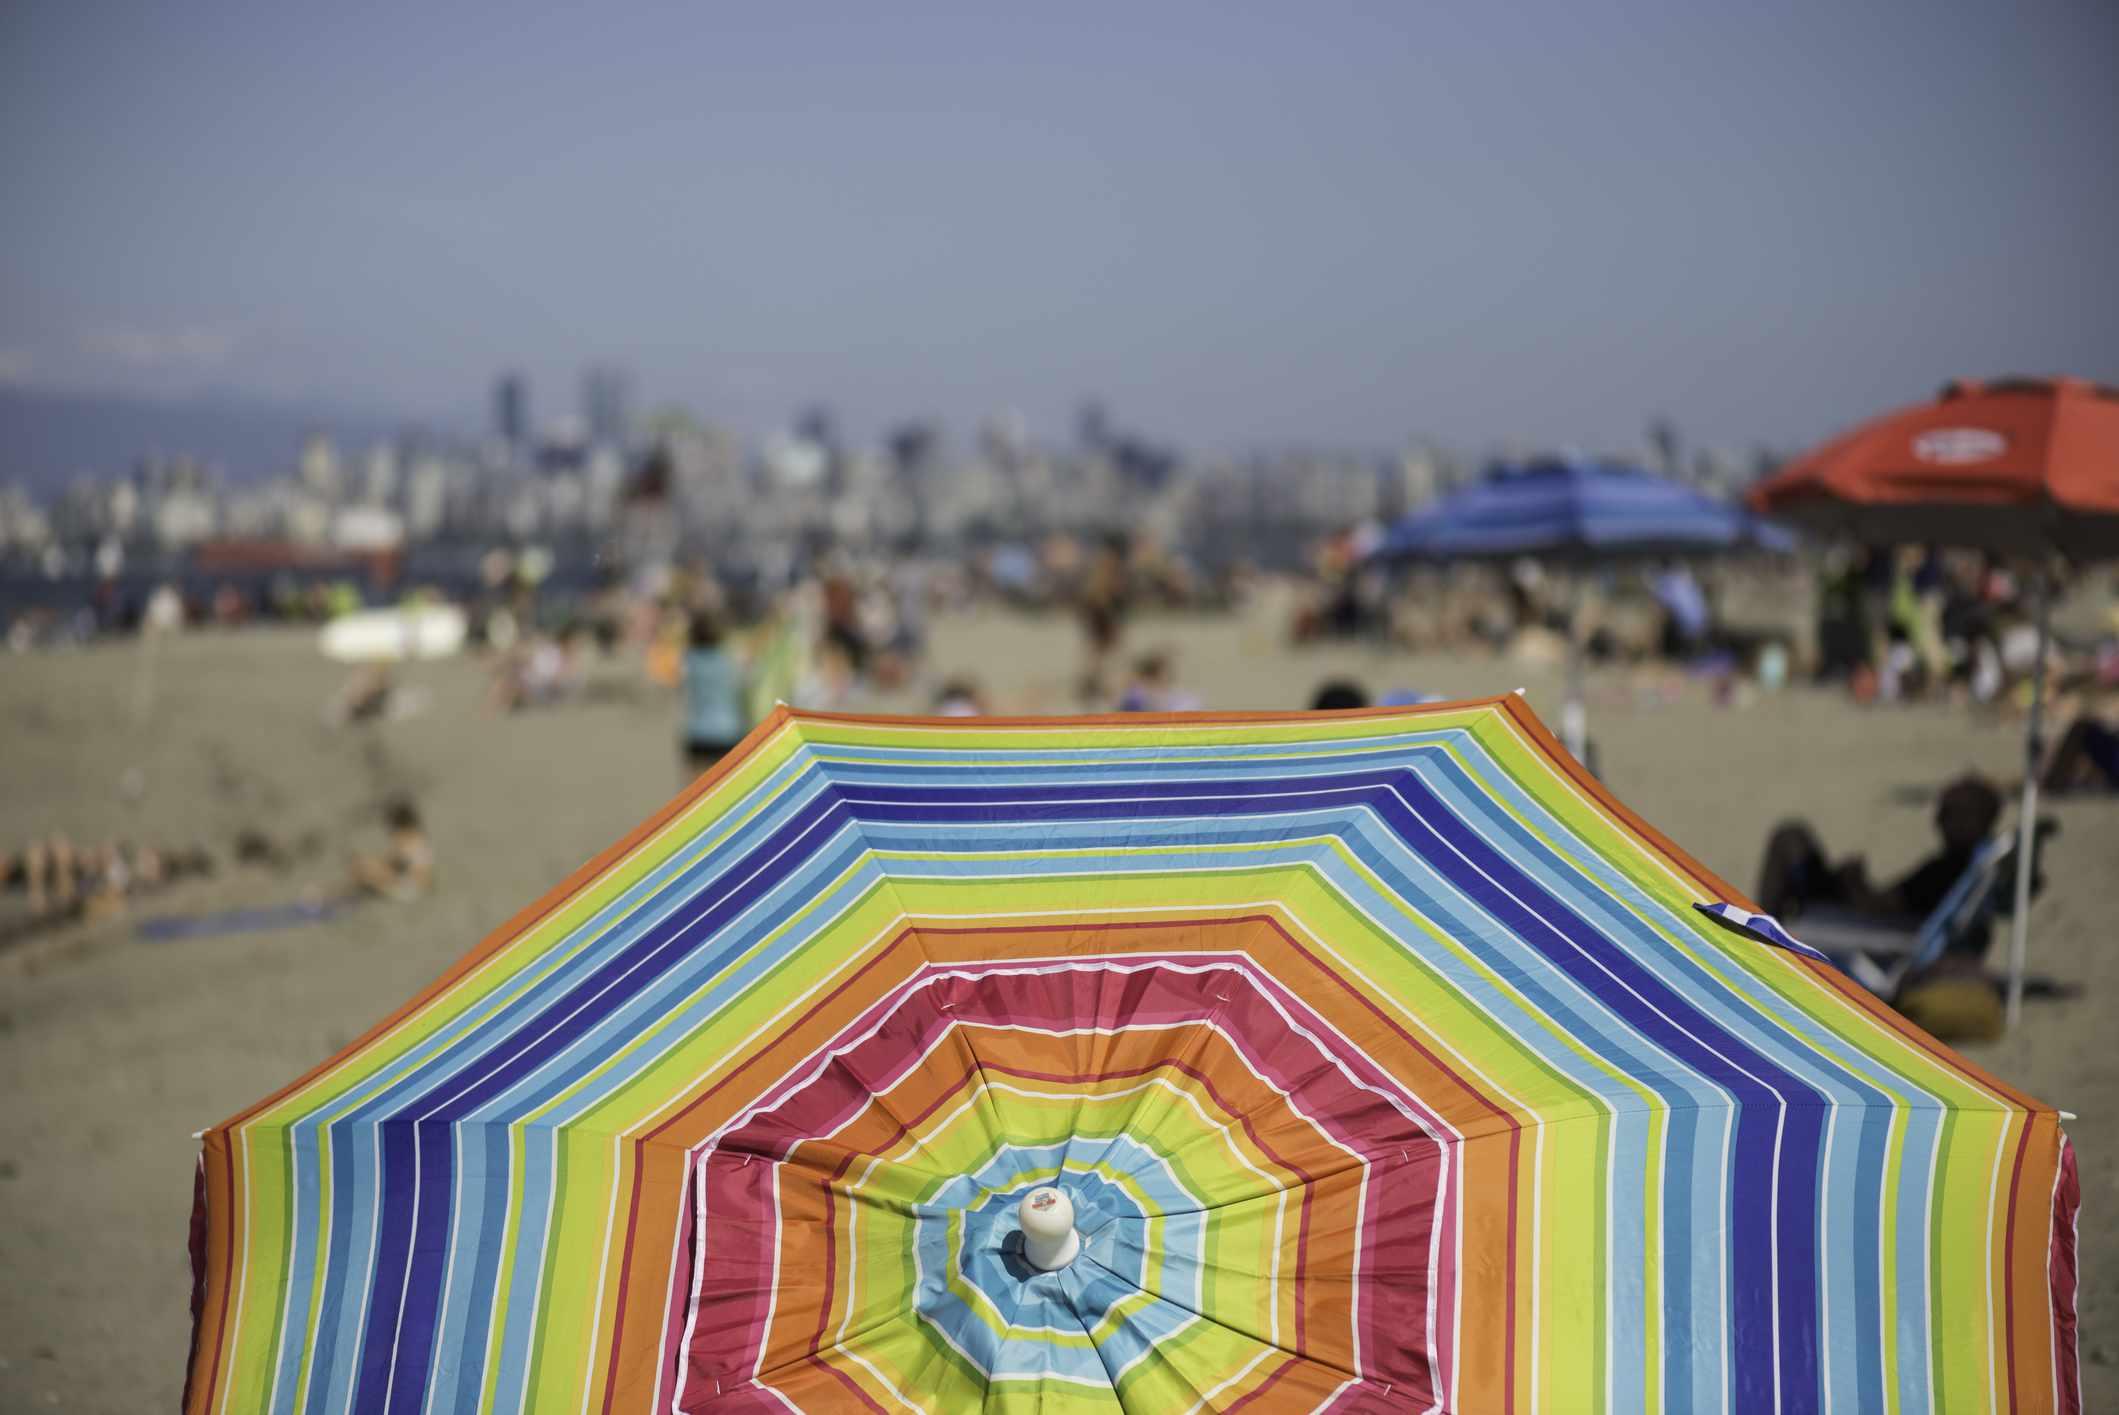 Beach umbrella at Spanish Banks, Vancouver